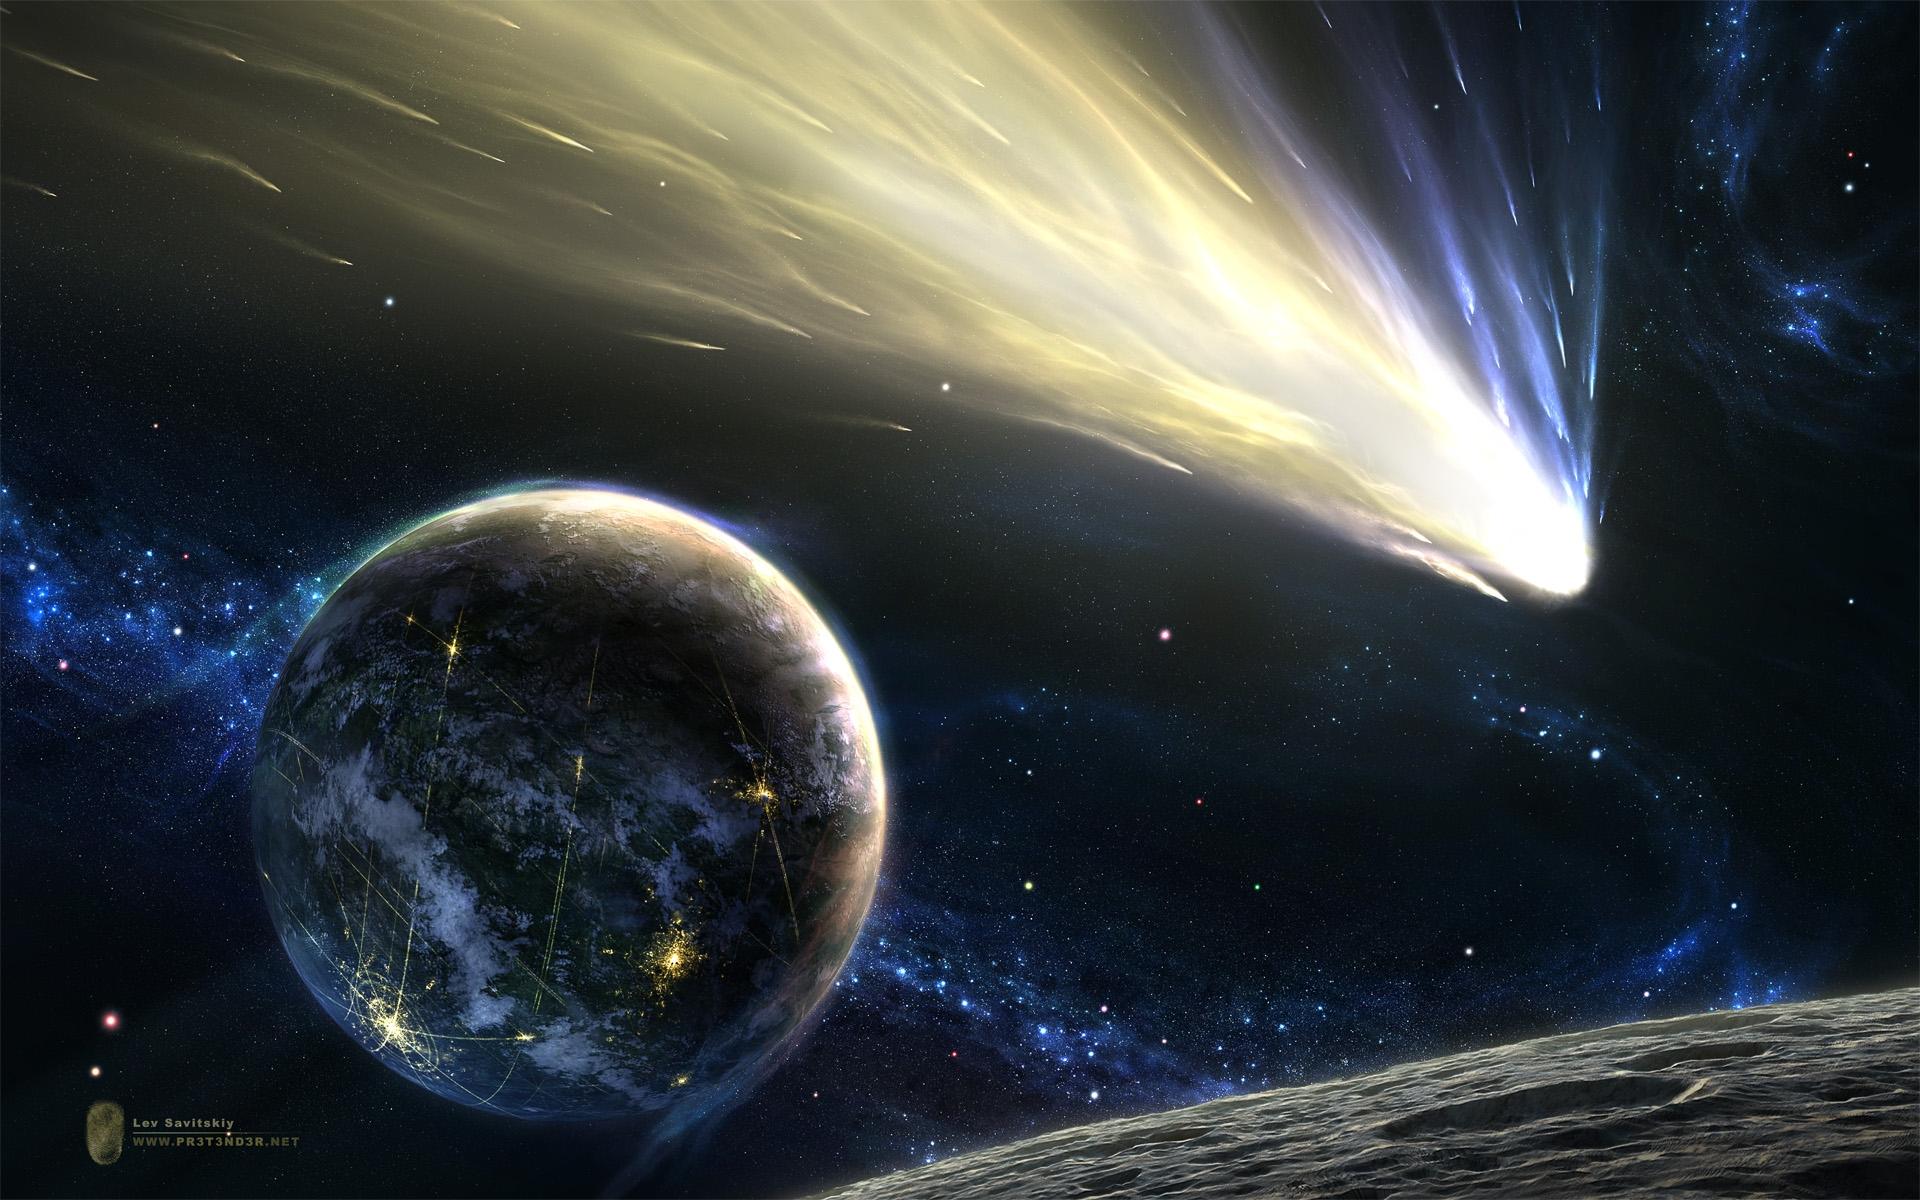 Комета  № 174119 бесплатно